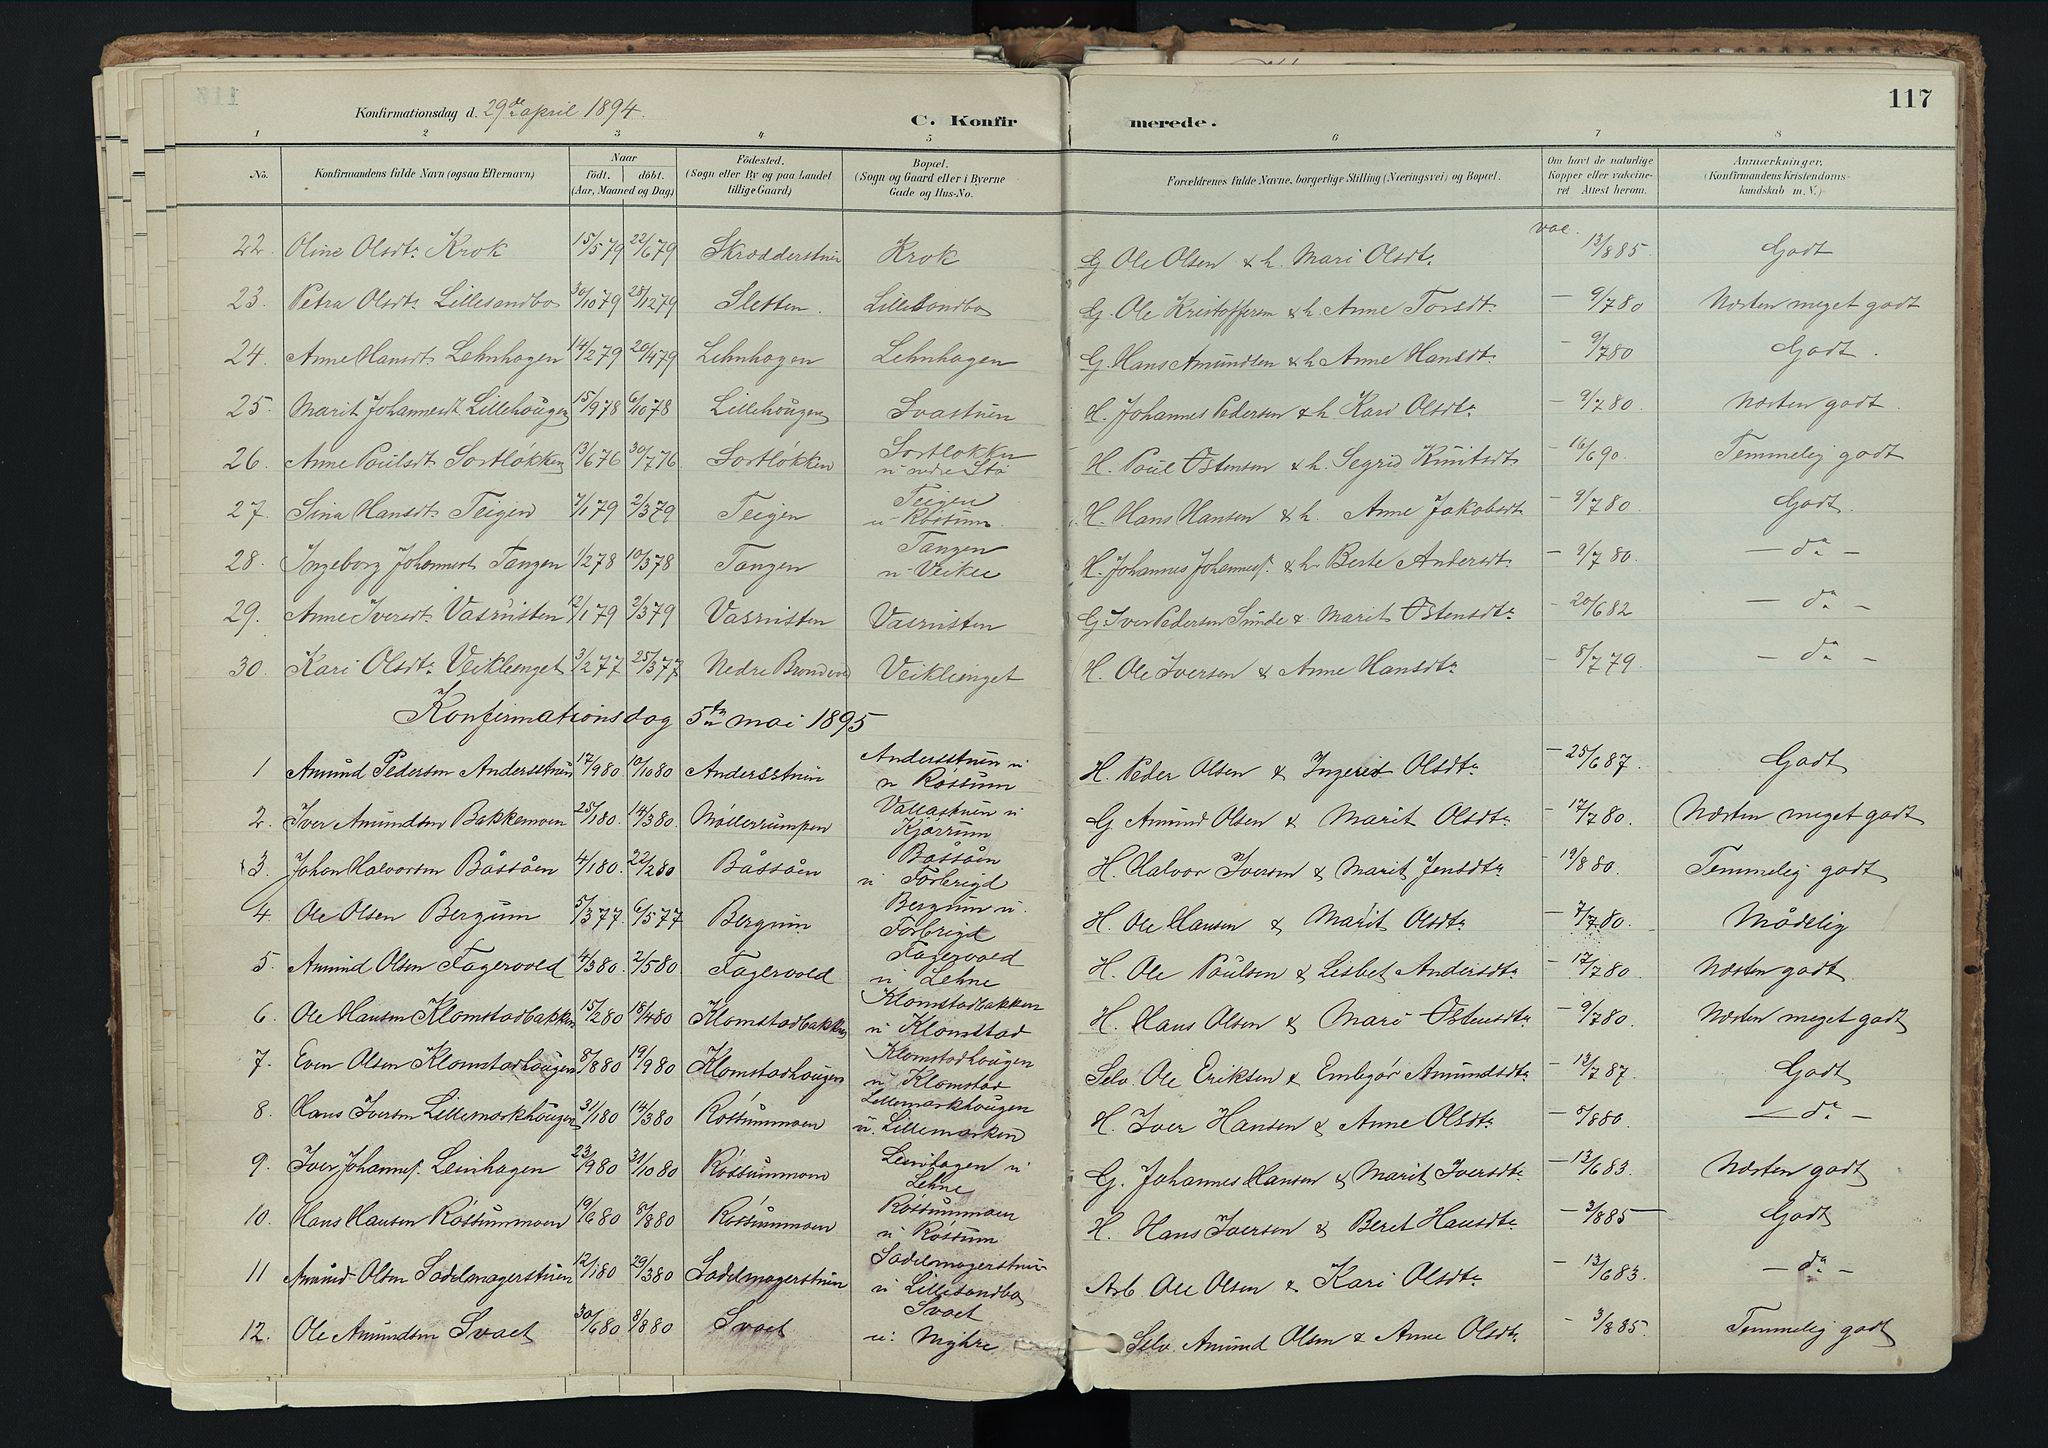 SAH, Nord-Fron prestekontor, Ministerialbok nr. 3, 1884-1914, s. 117